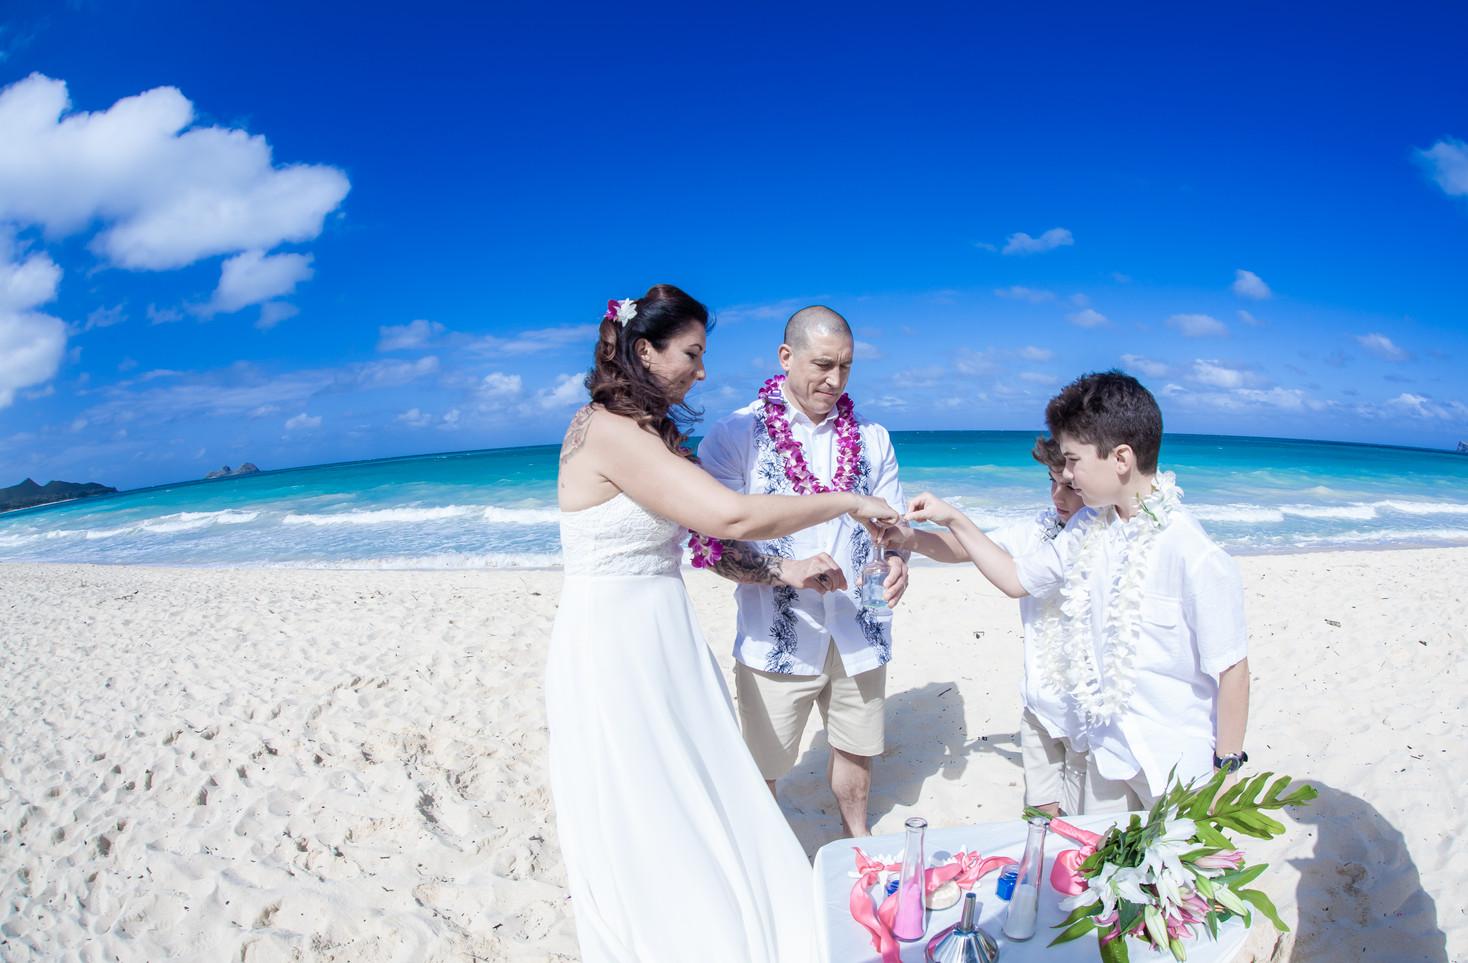 Wedding-picture-2-25.jpg